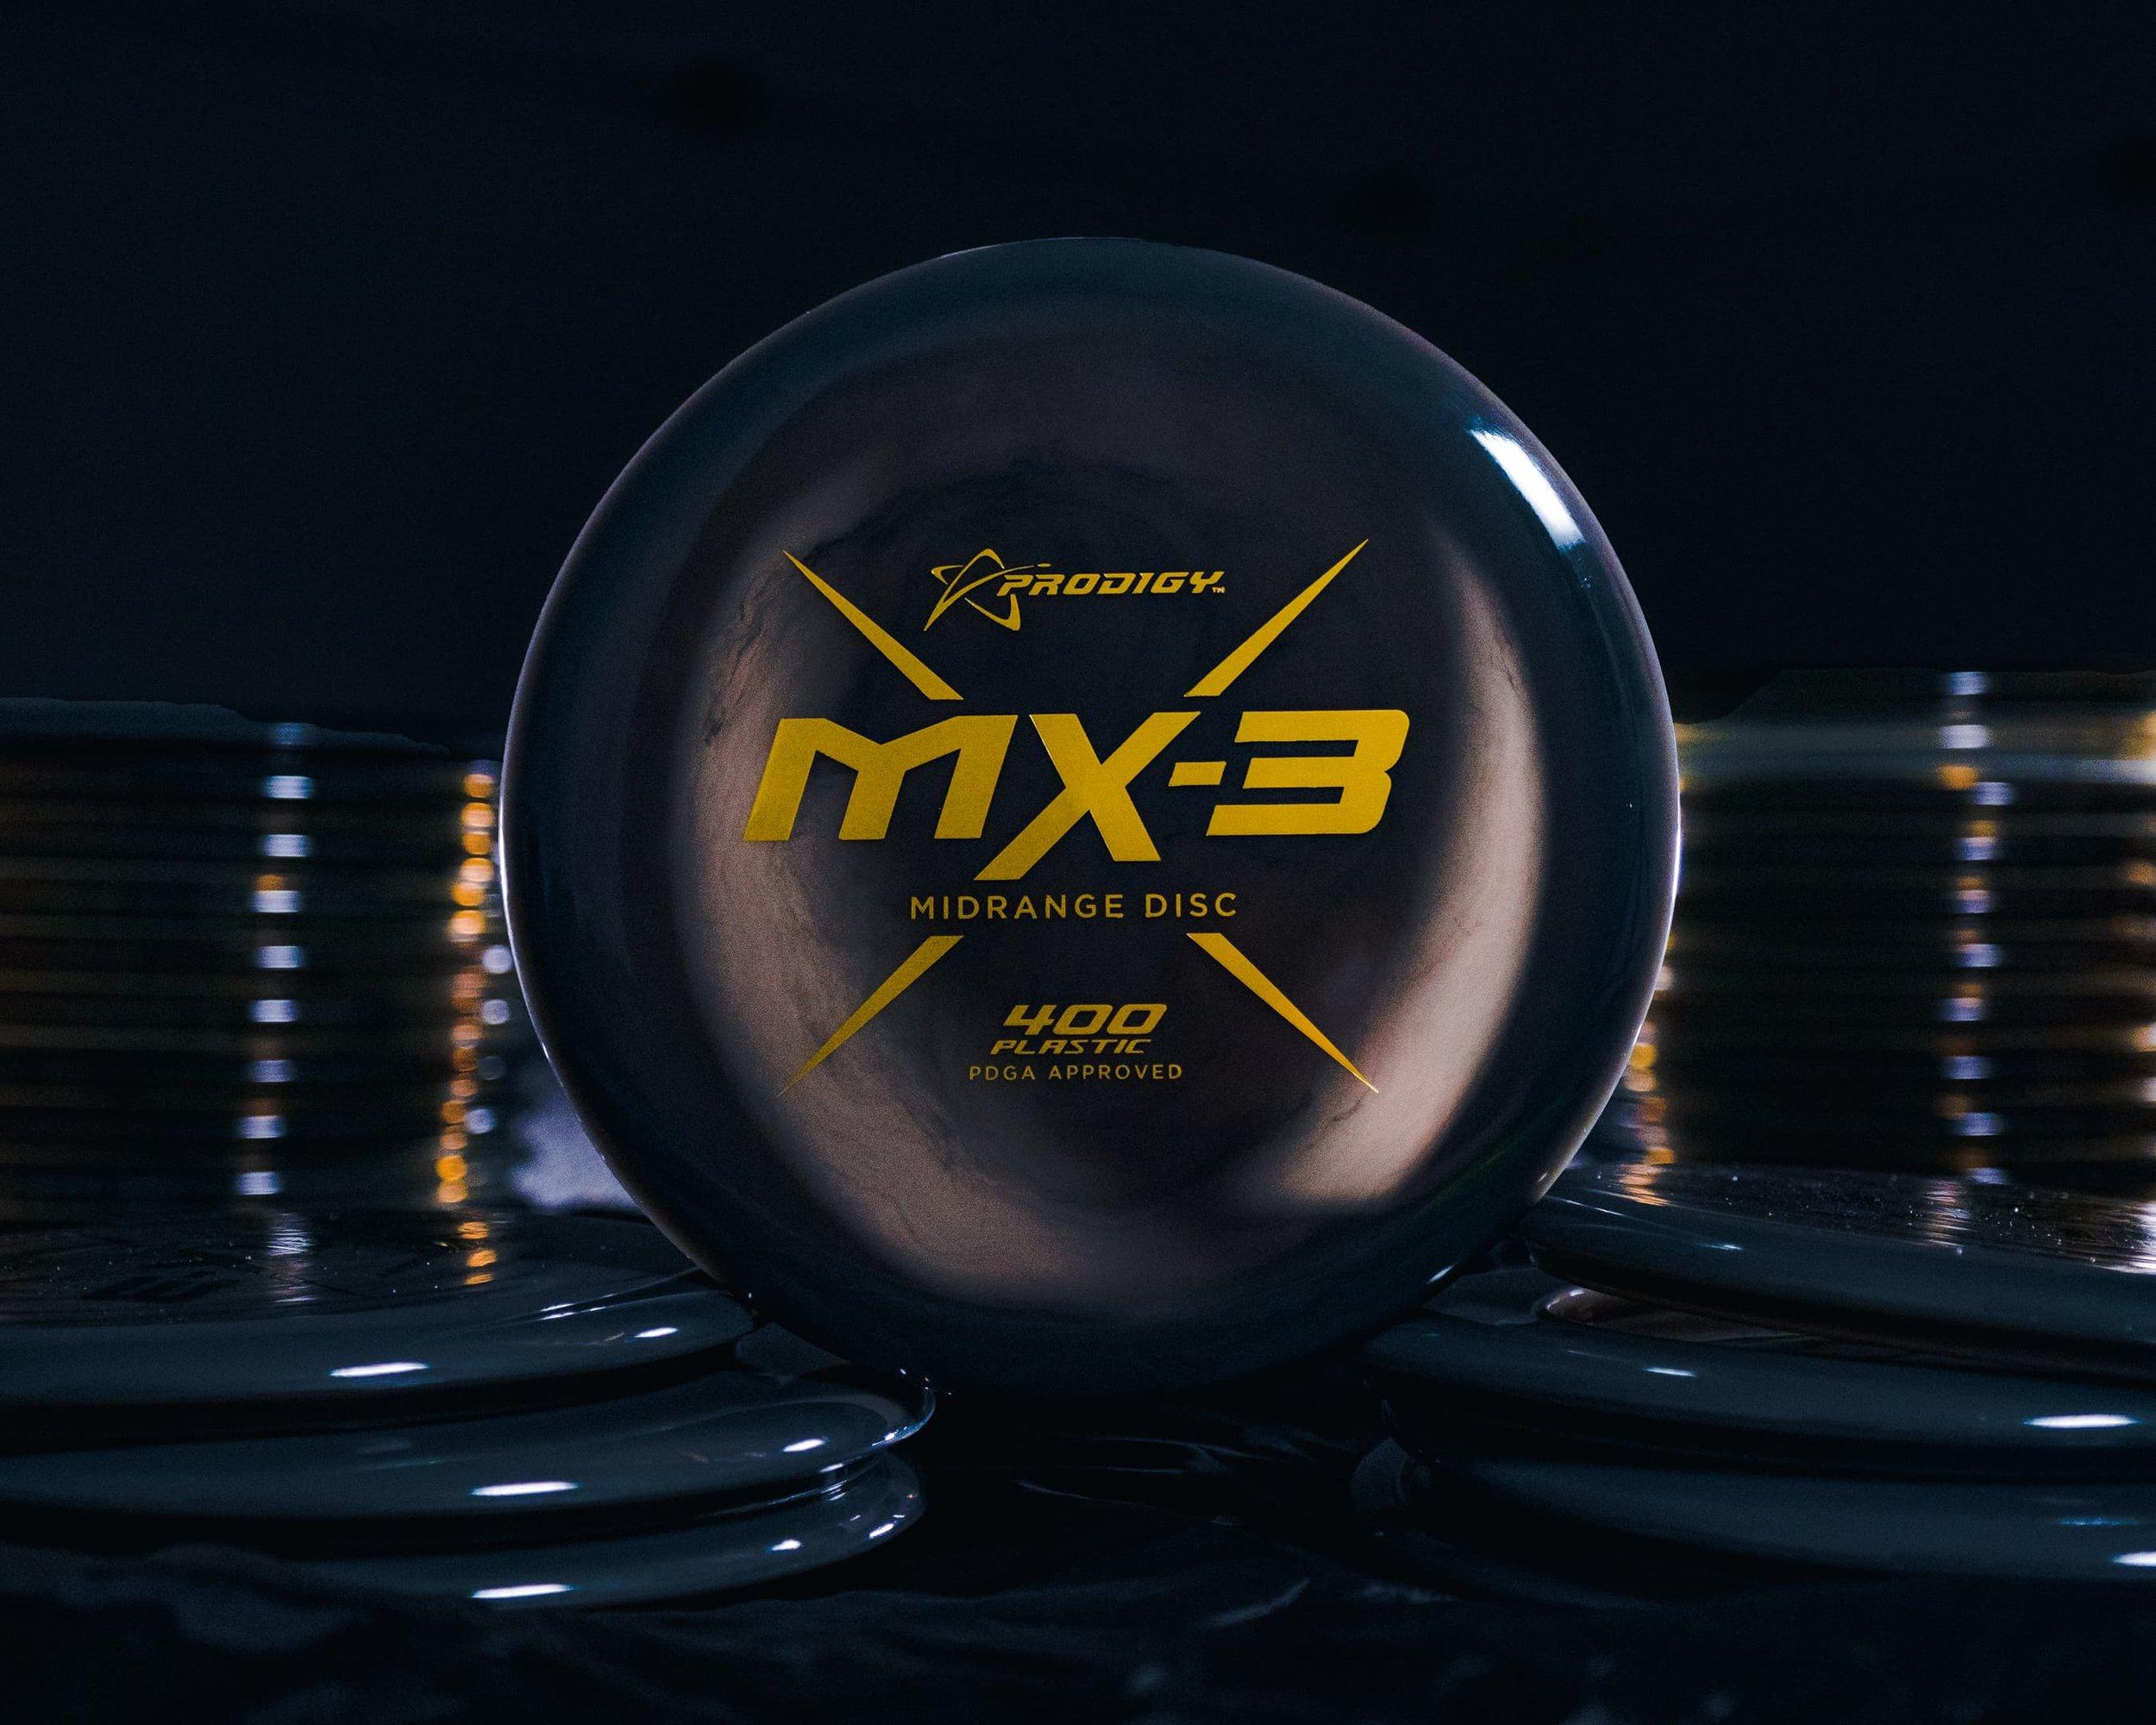 MX-3_400_LIFESTYLE_OPT_3.jpg